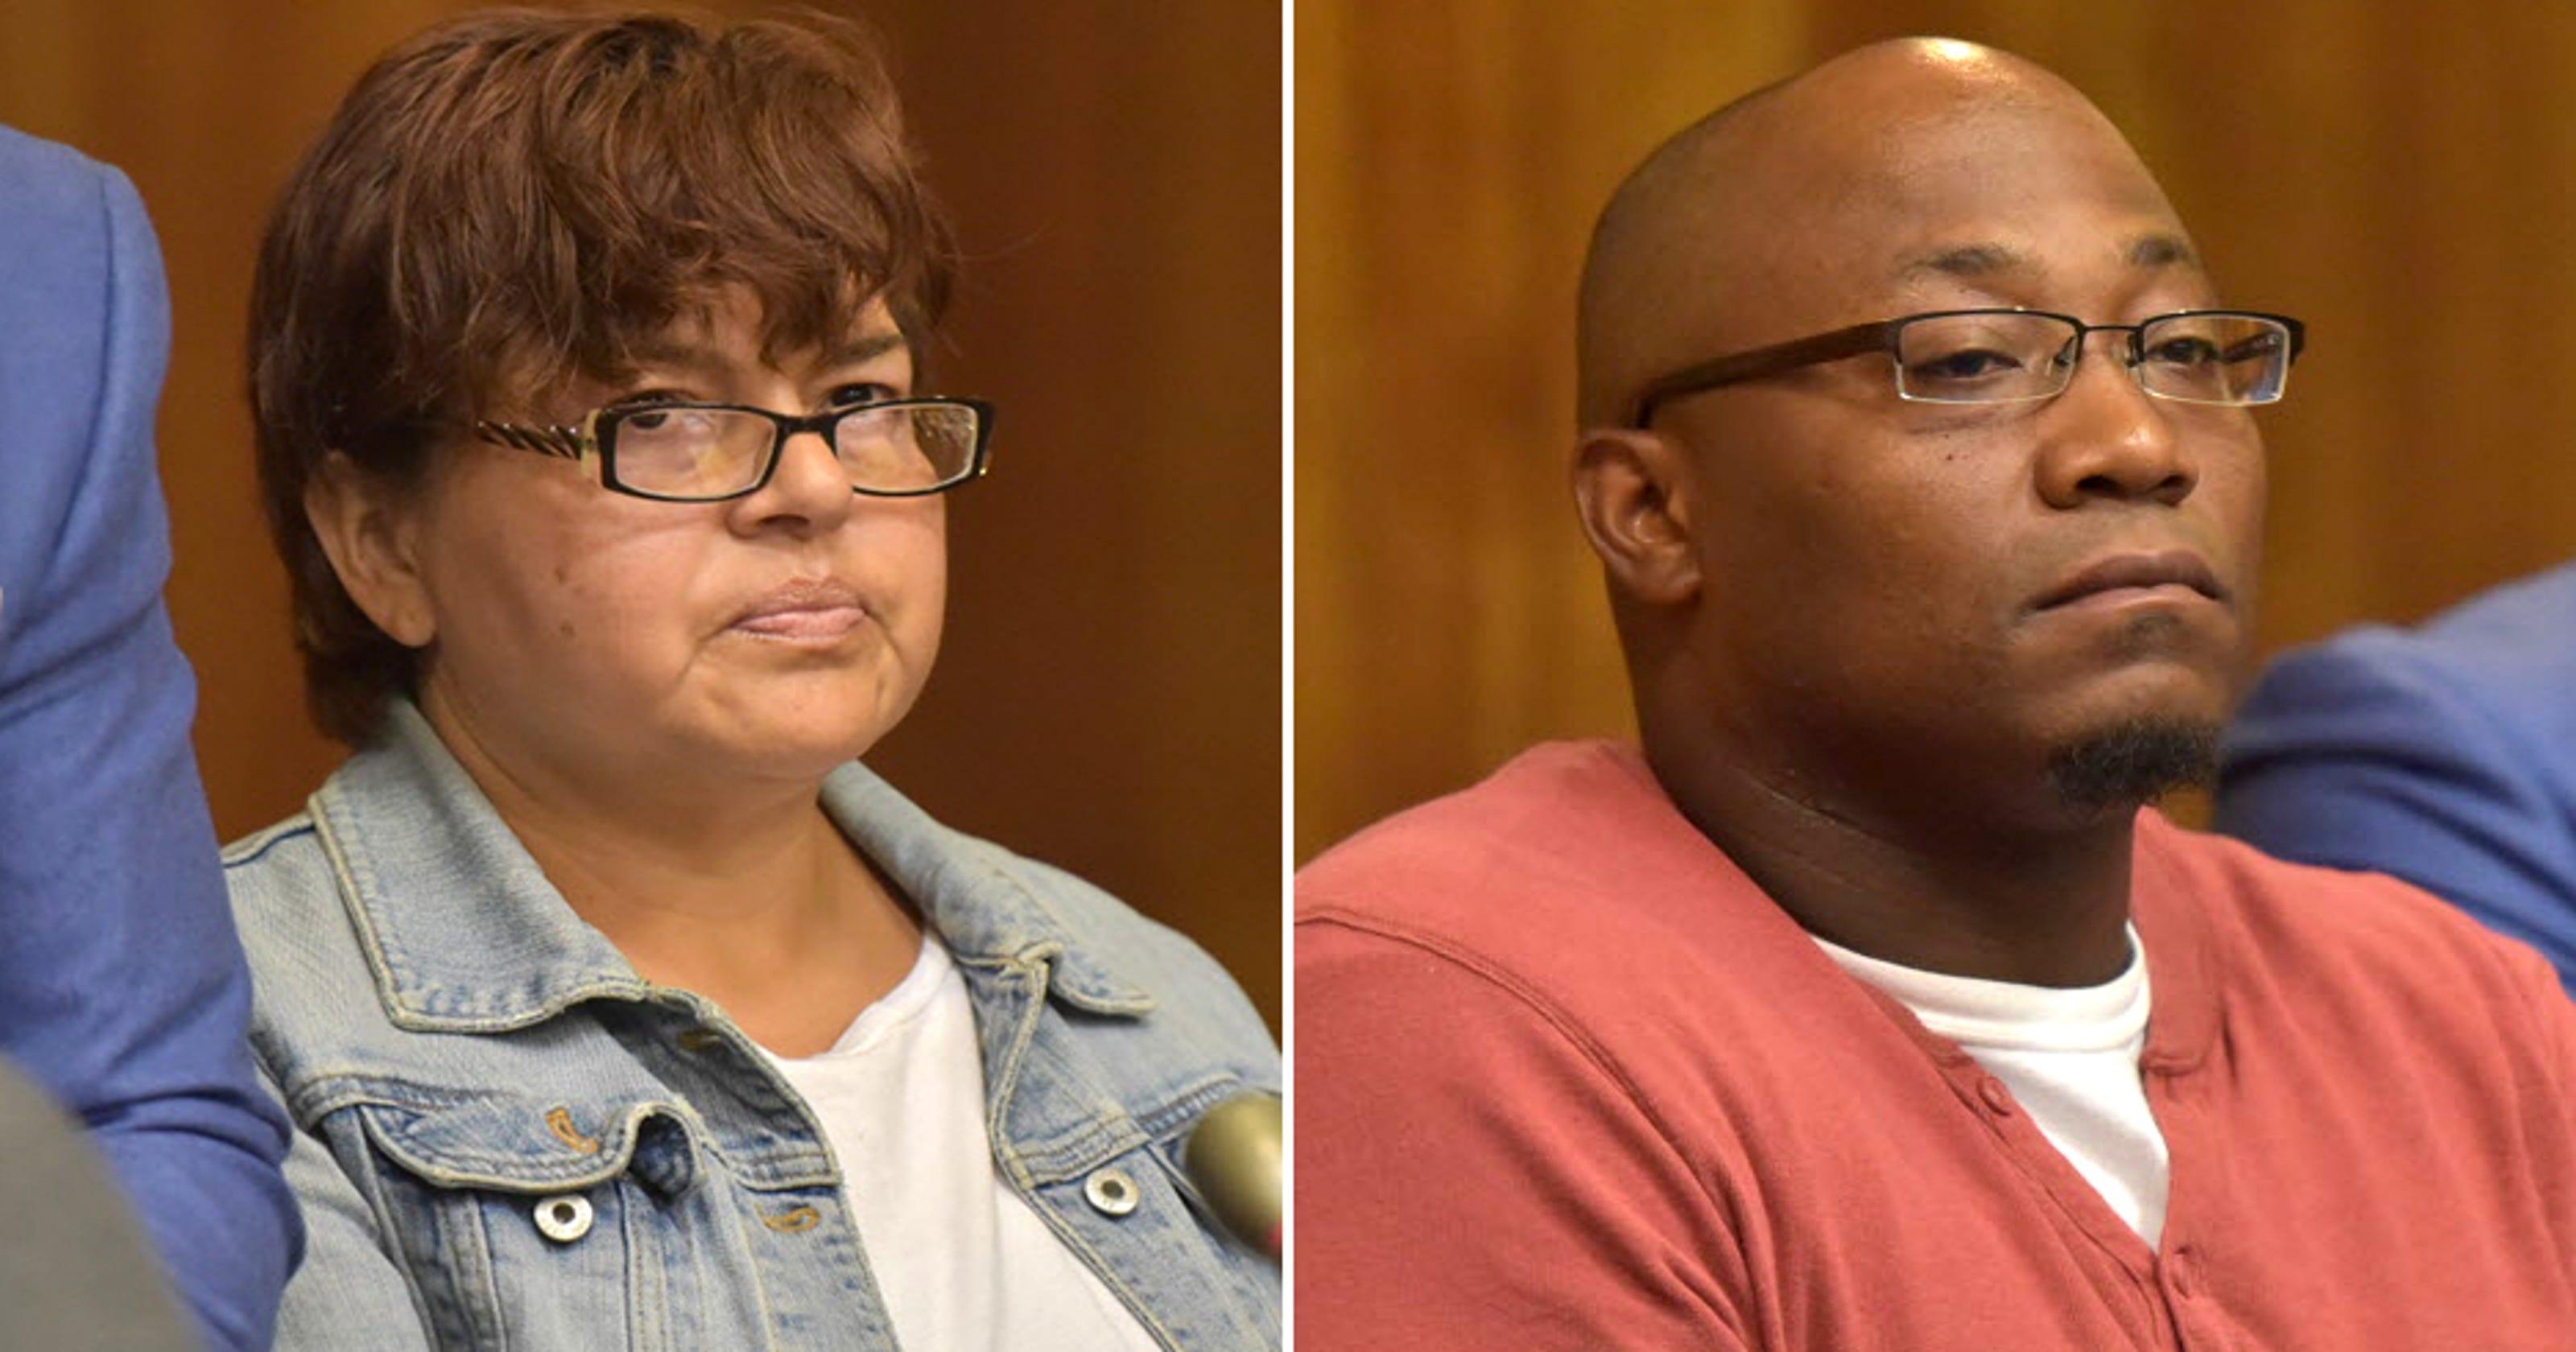 Former Passaic County employee, boyfriend get prison terms